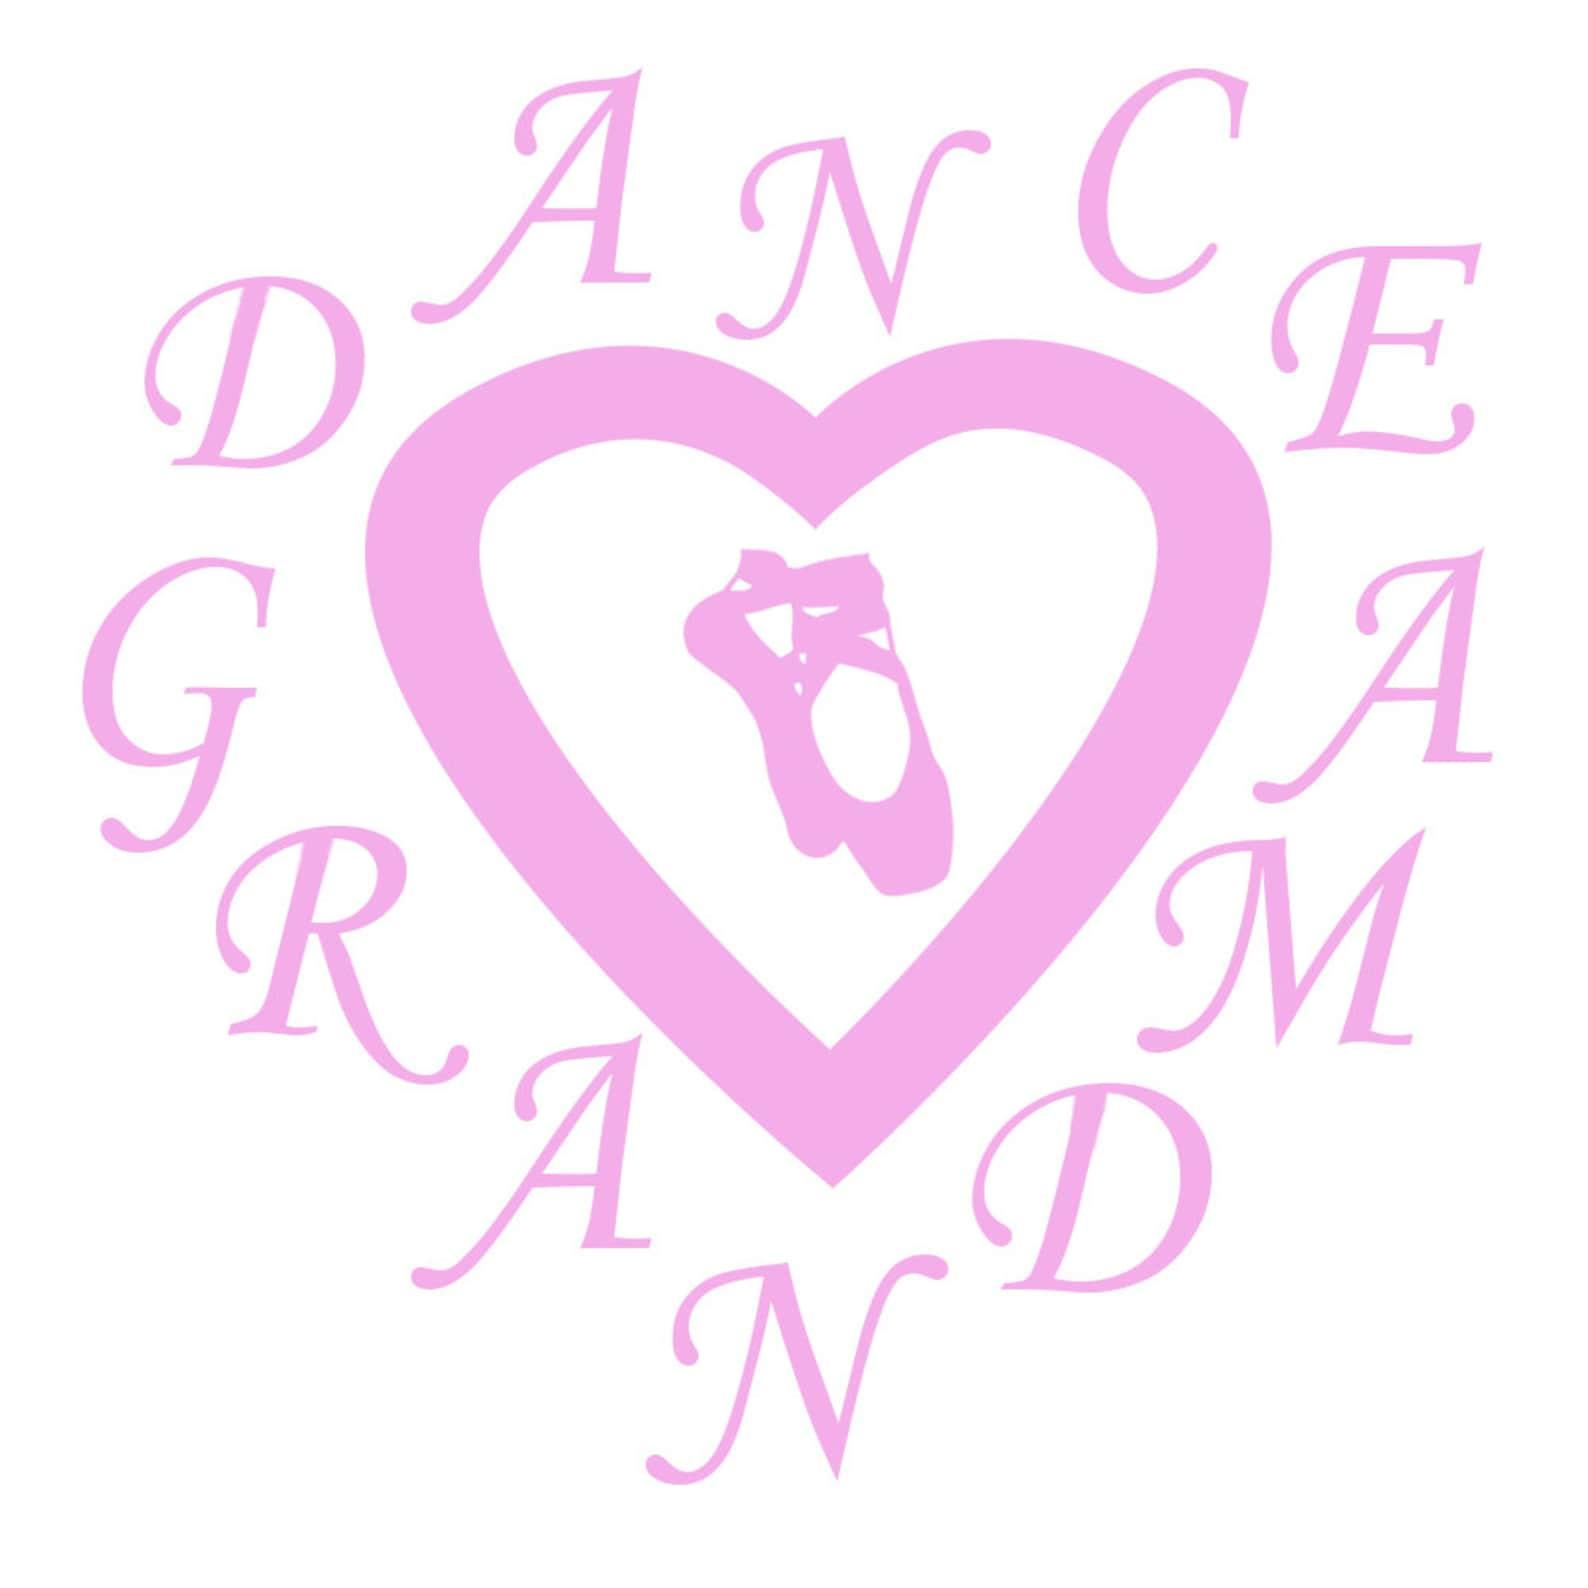 dance stickers, ballet stickers, dance mom svg,ballet svg, dance grandma, heart and dance shoes, ballet mom, ballet grandma, bal